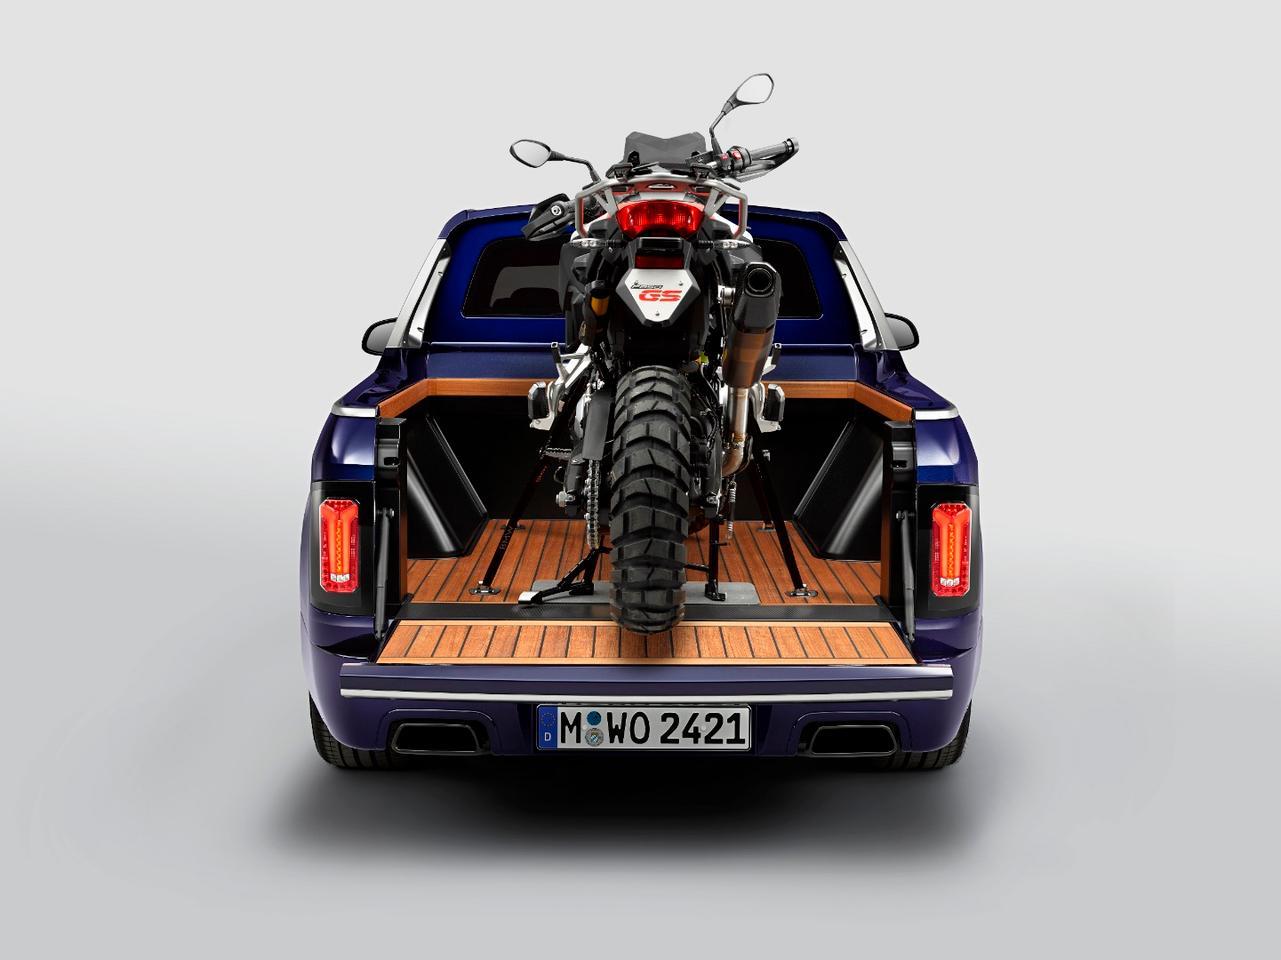 BMWshowedthe X7 Pick-up and F 850 GSadventure bike for Motorrad Days